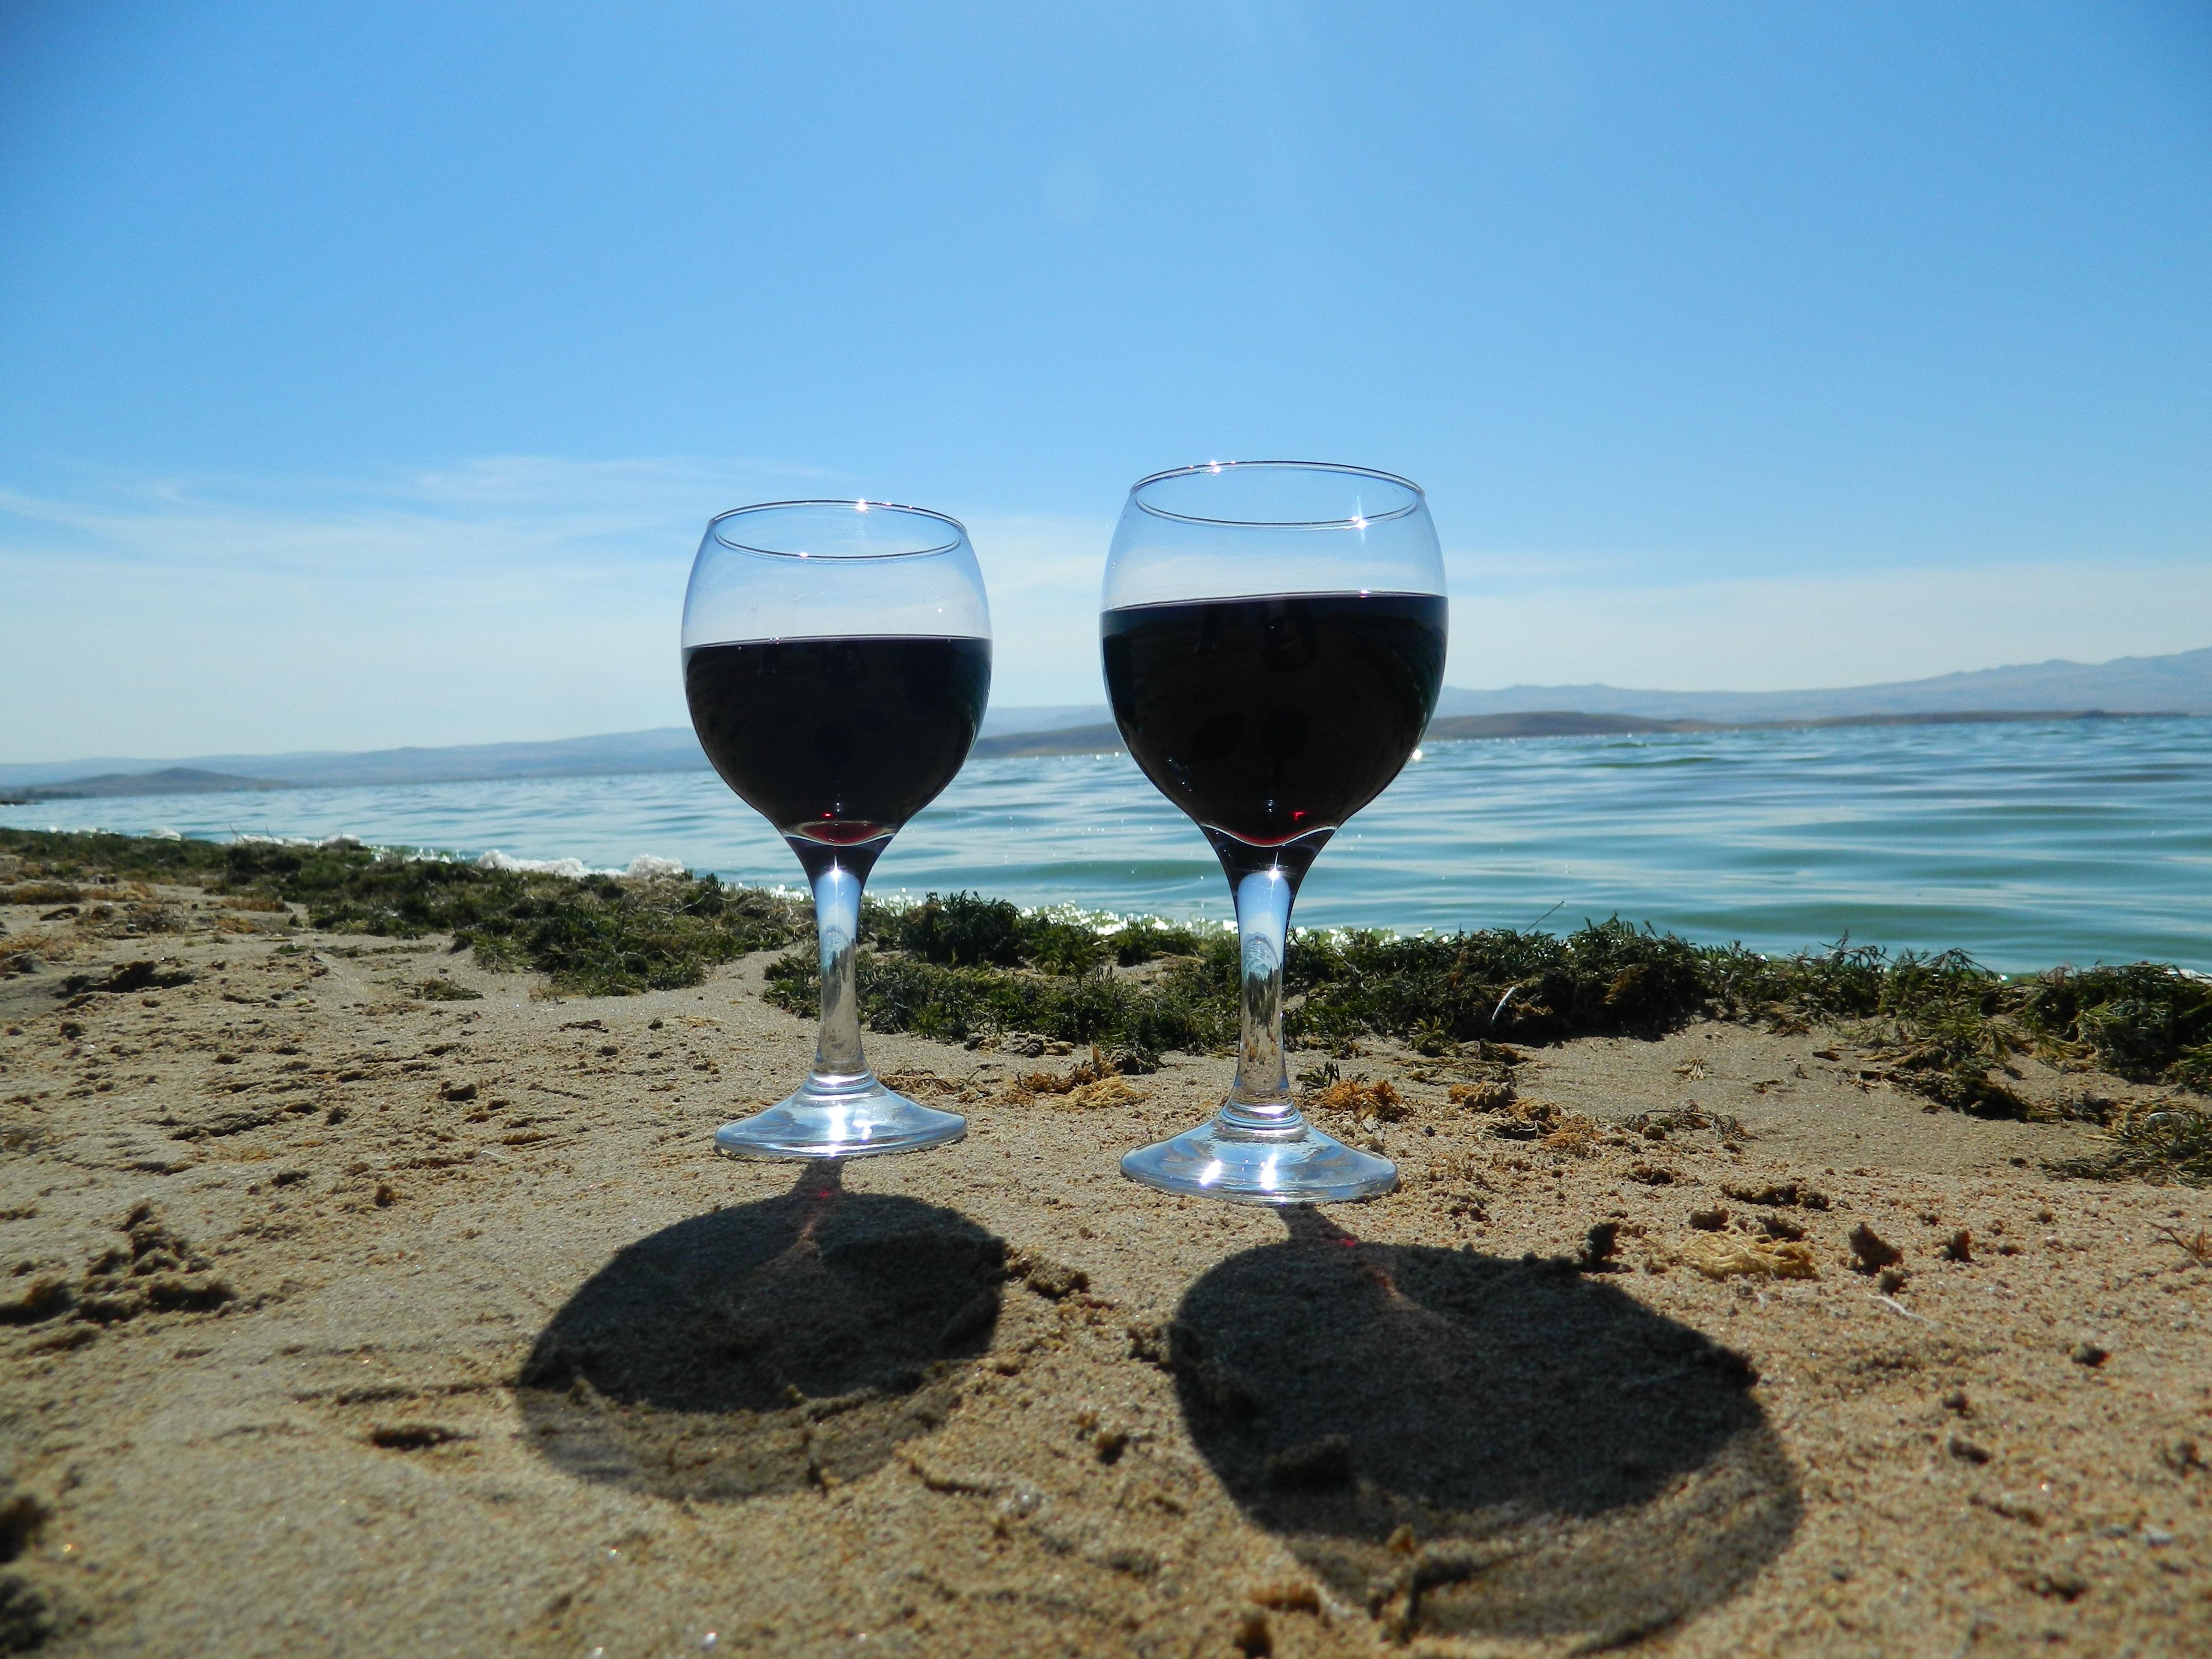 картинки бокалов с вином на фоне моря словам хорват